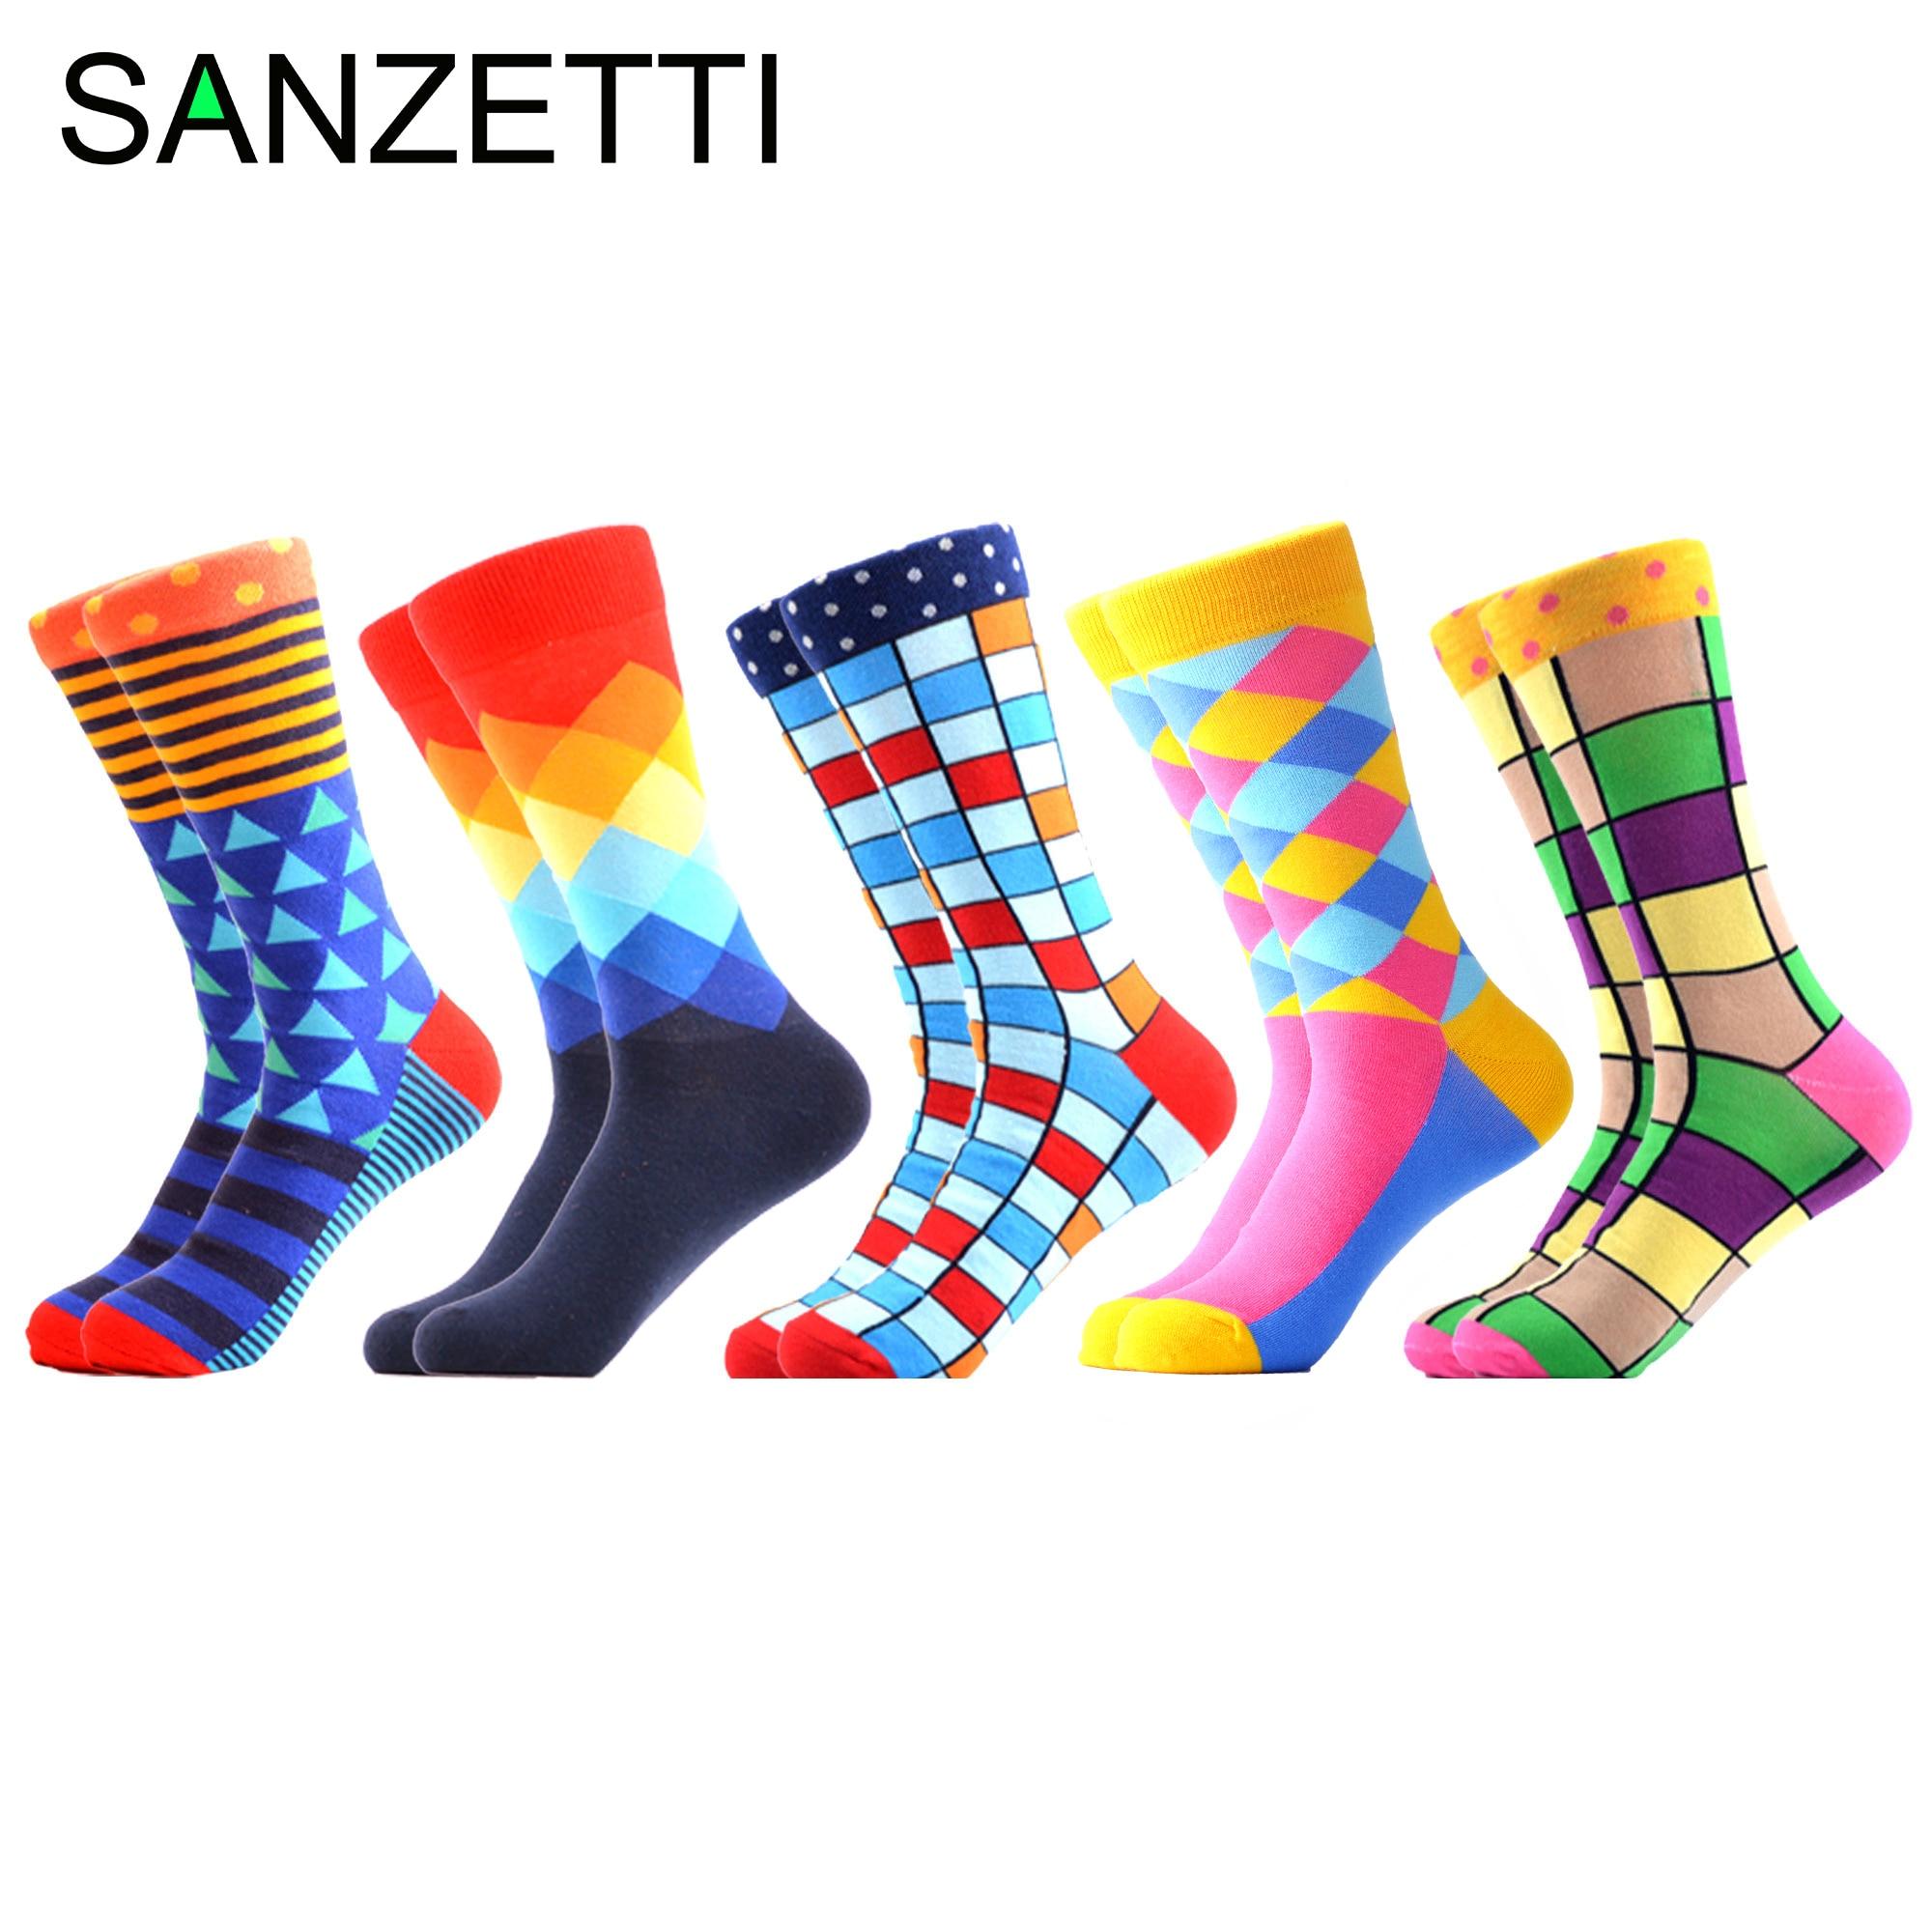 SANZETTI 5 Pairs/Lot 2020 New Men Casual Colorful Happy Socks Street Hip Hop Novelty Fun Combed Cotton Socks Wedding Gift Socks